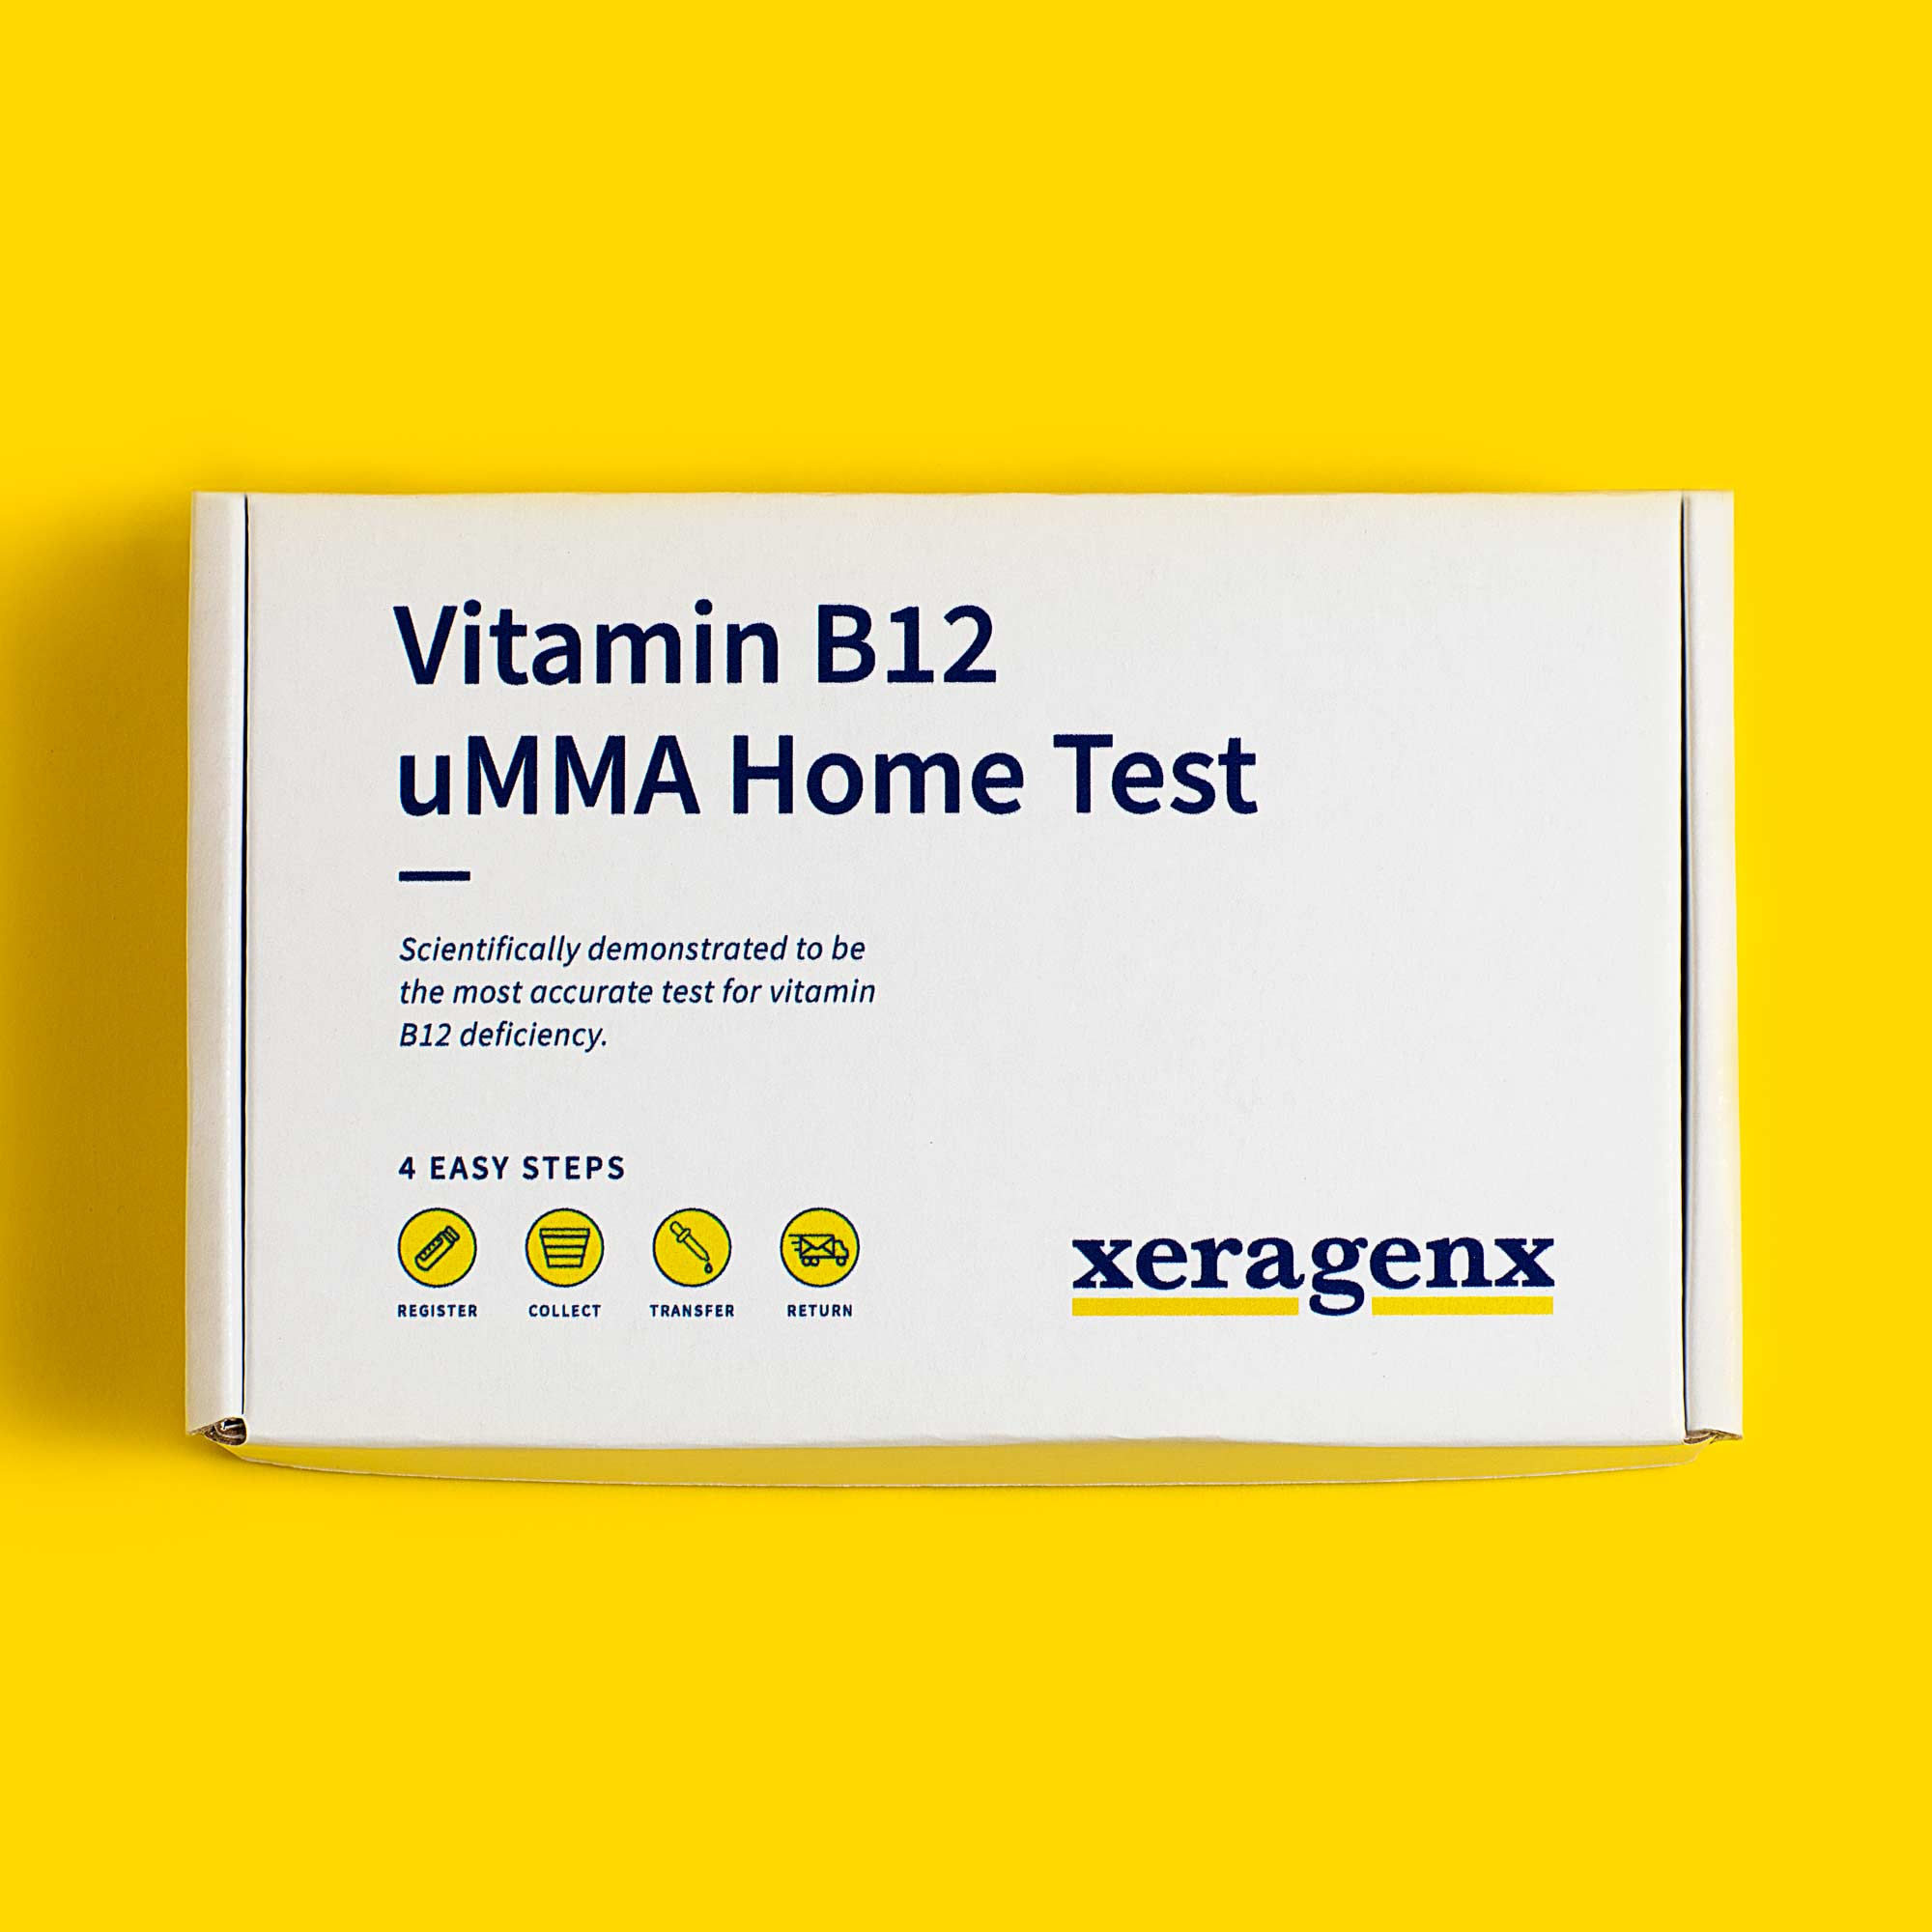 Vitamin B12 uMMA Home Test